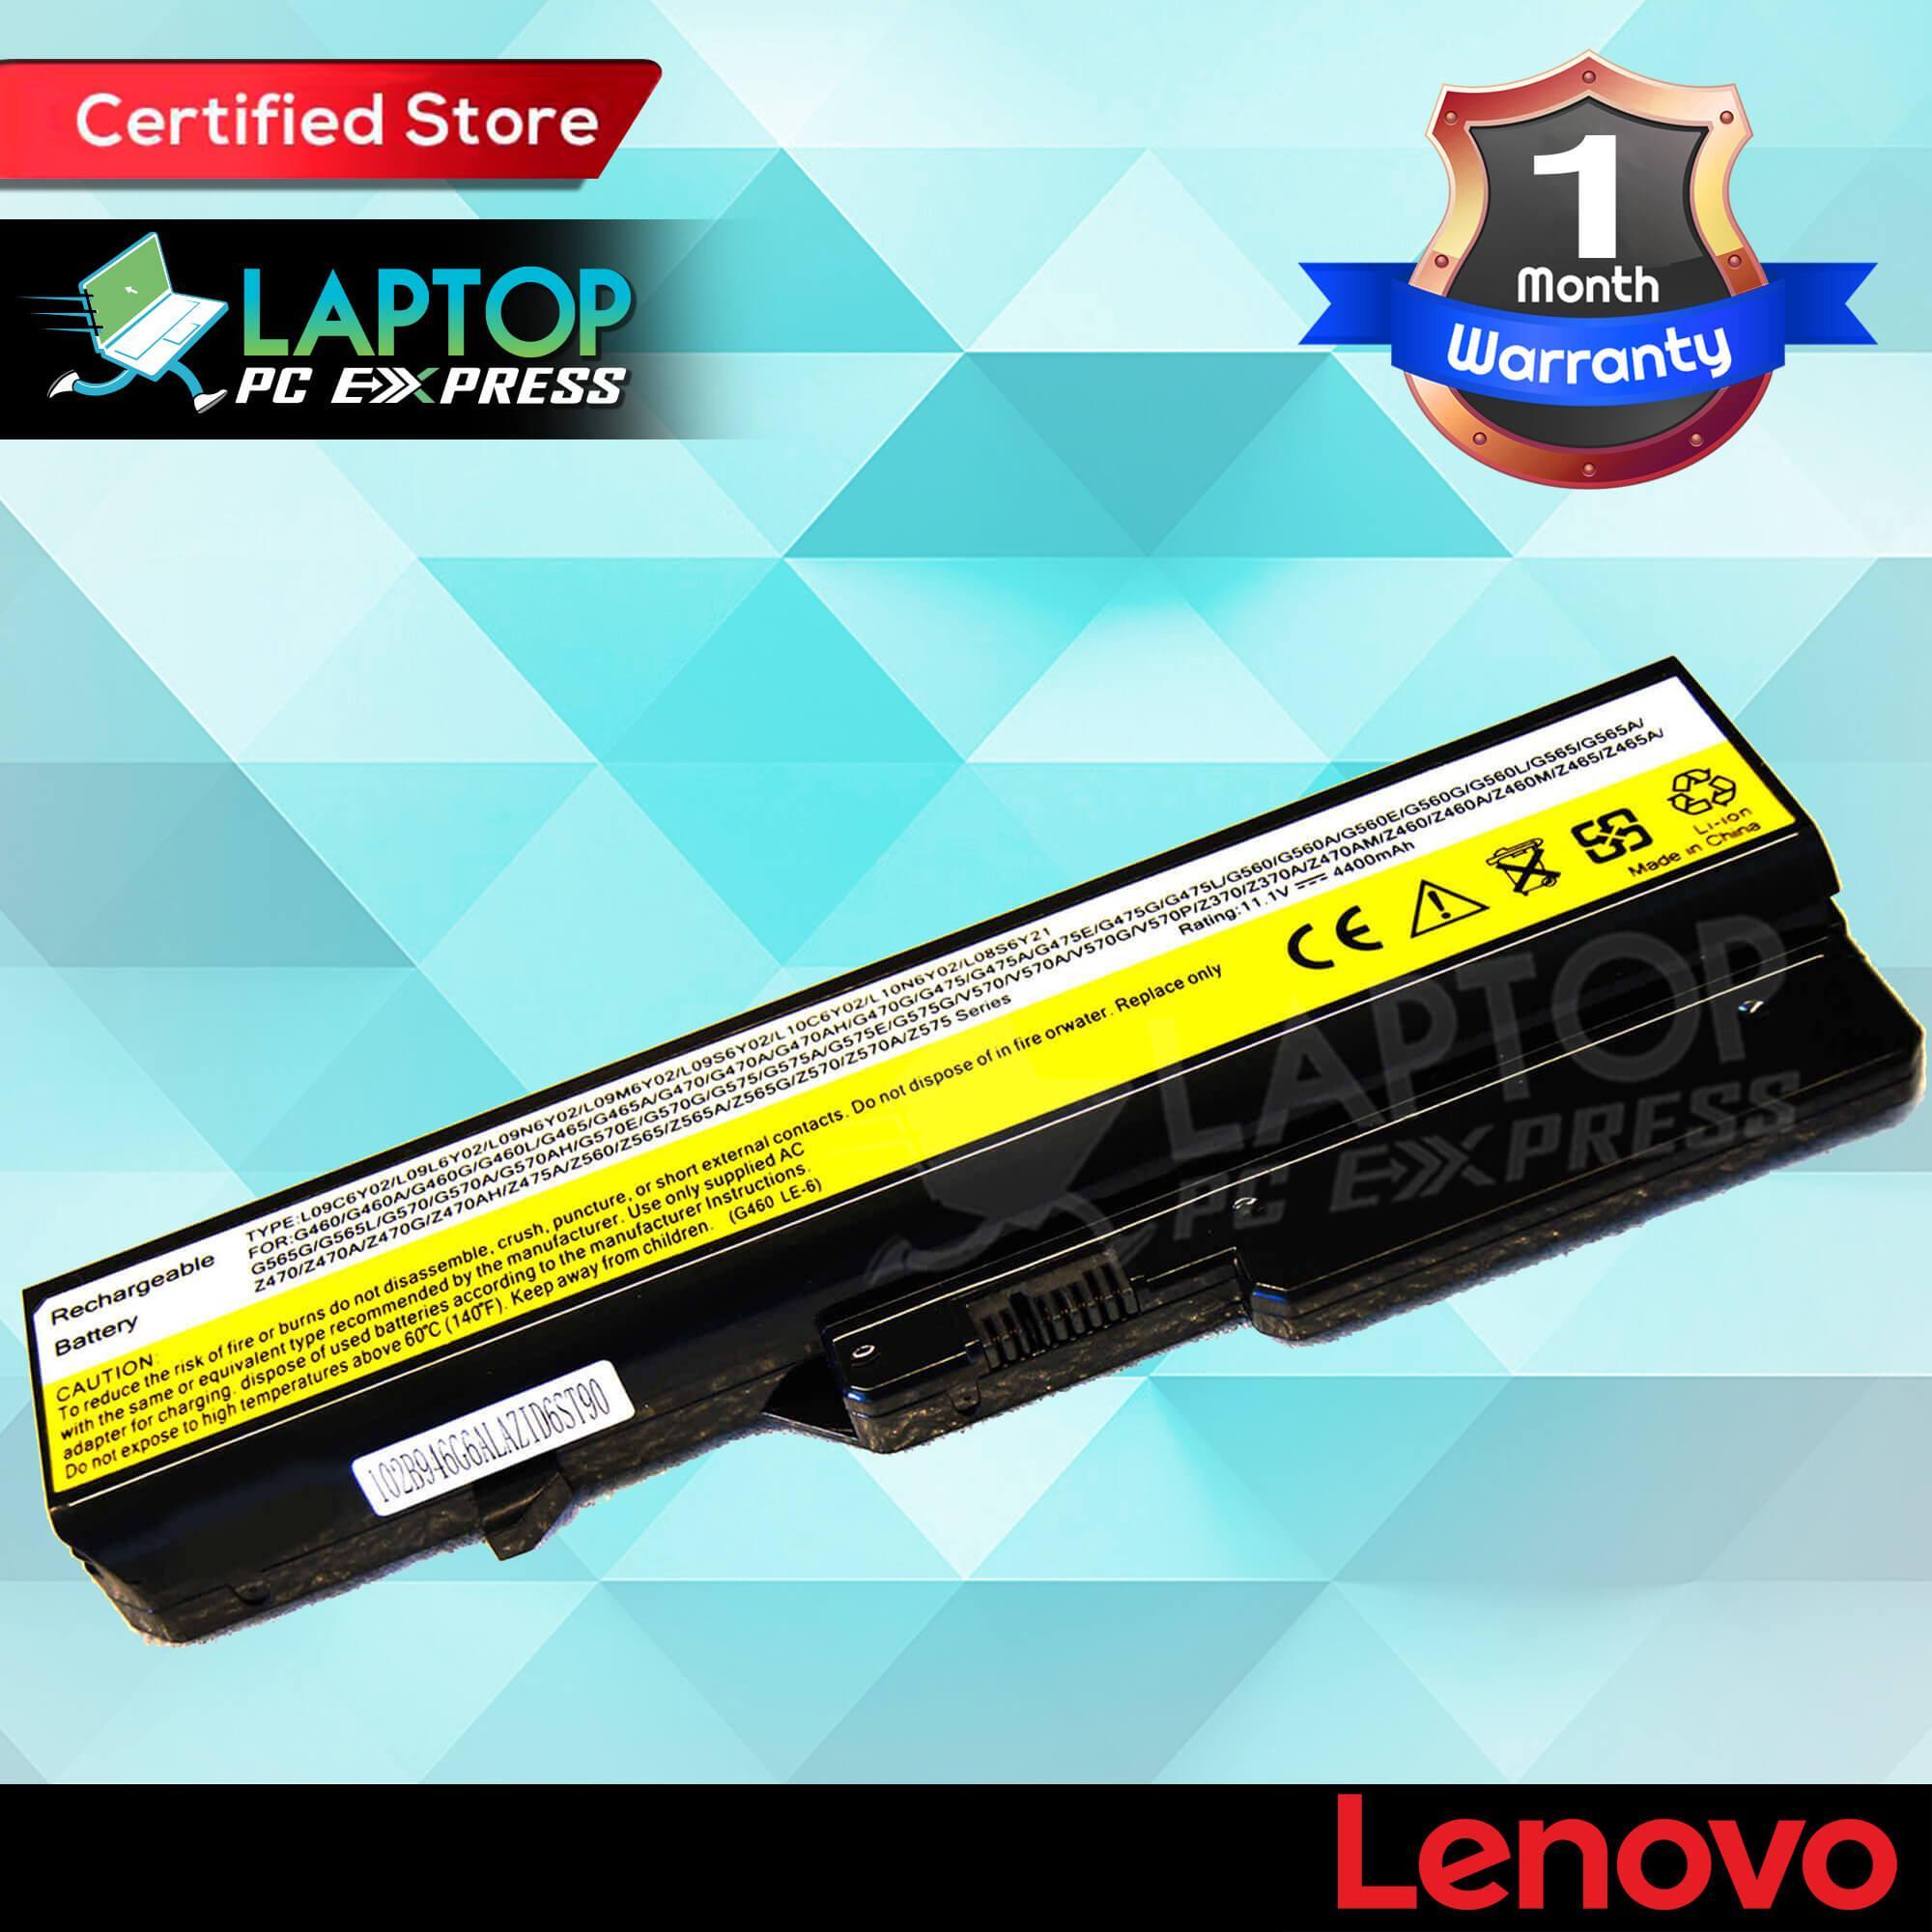 Lenovo Laptop Battery L08S6Y21 L09C6Y02 L09L6Y02 L09M6Y02 L09N6Y02 L09S6Y02  L10C6Y02 L10M6F21 L10P6F21 L10P6Y22 LO9L6Y02 LO9S6Y02